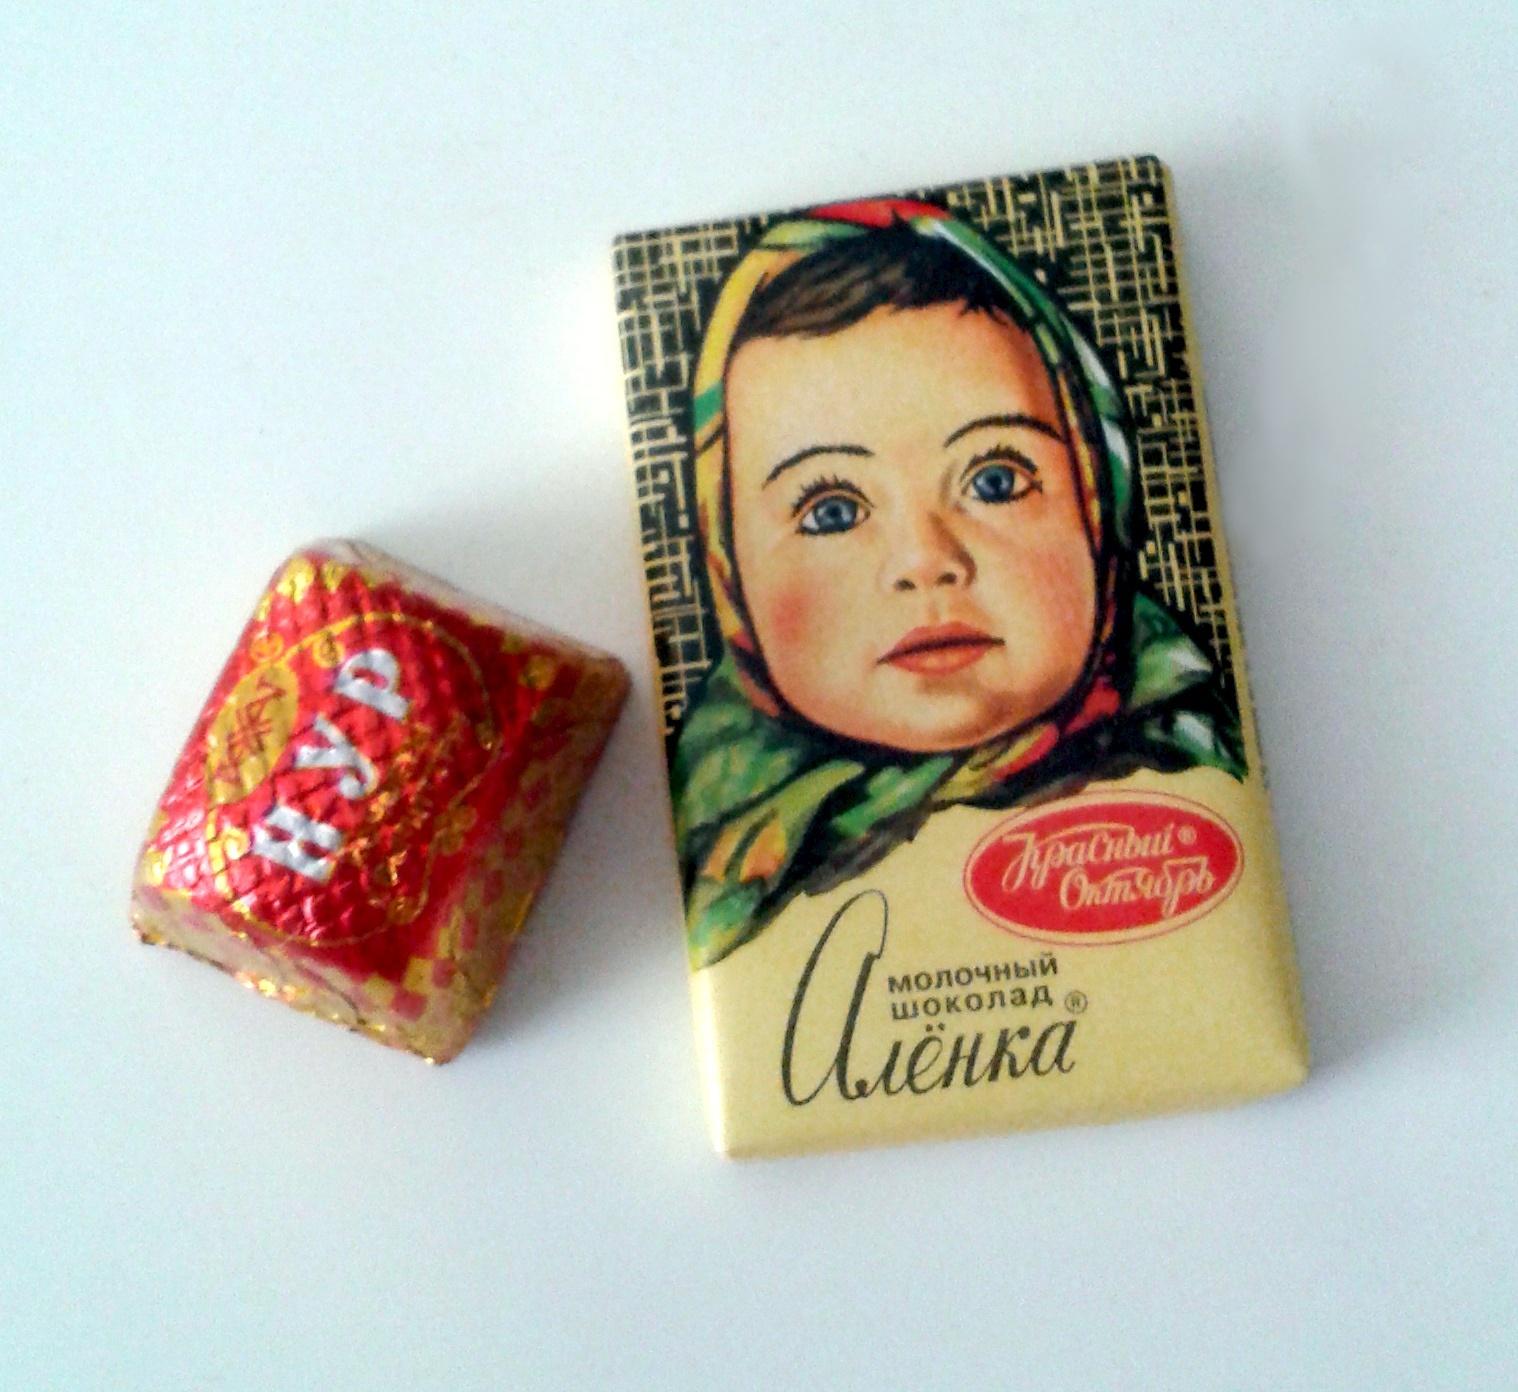 Russian chocolate---шоколад вкусный Россия by Mario photo